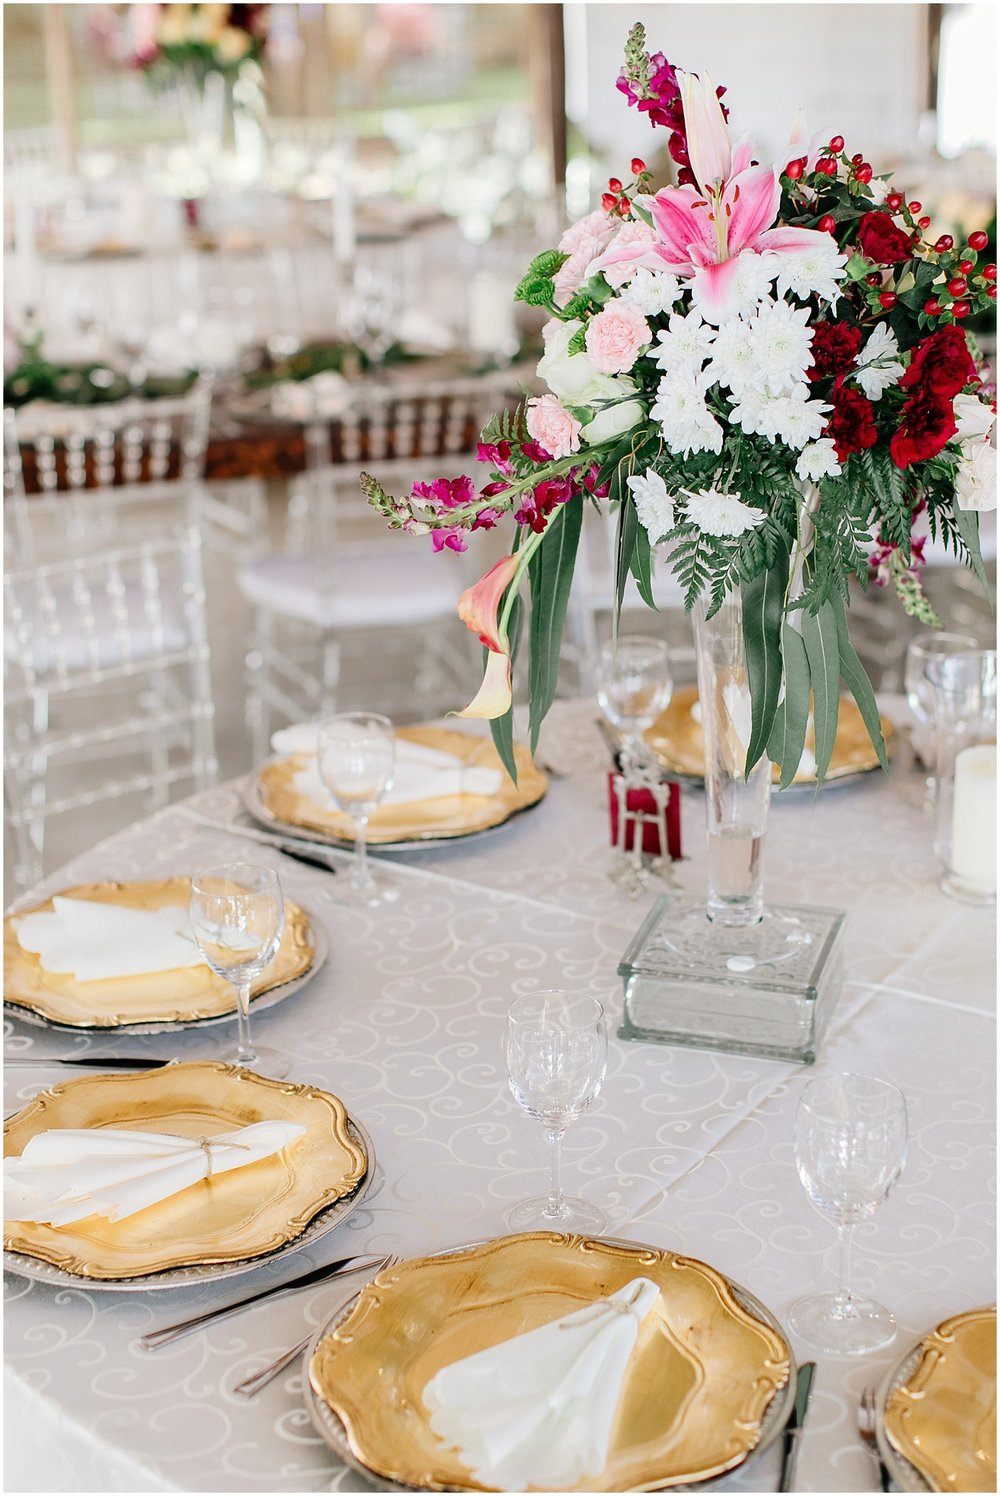 brecher-wedding-rolene-photography-pongola-country-lodge_0007.jpg